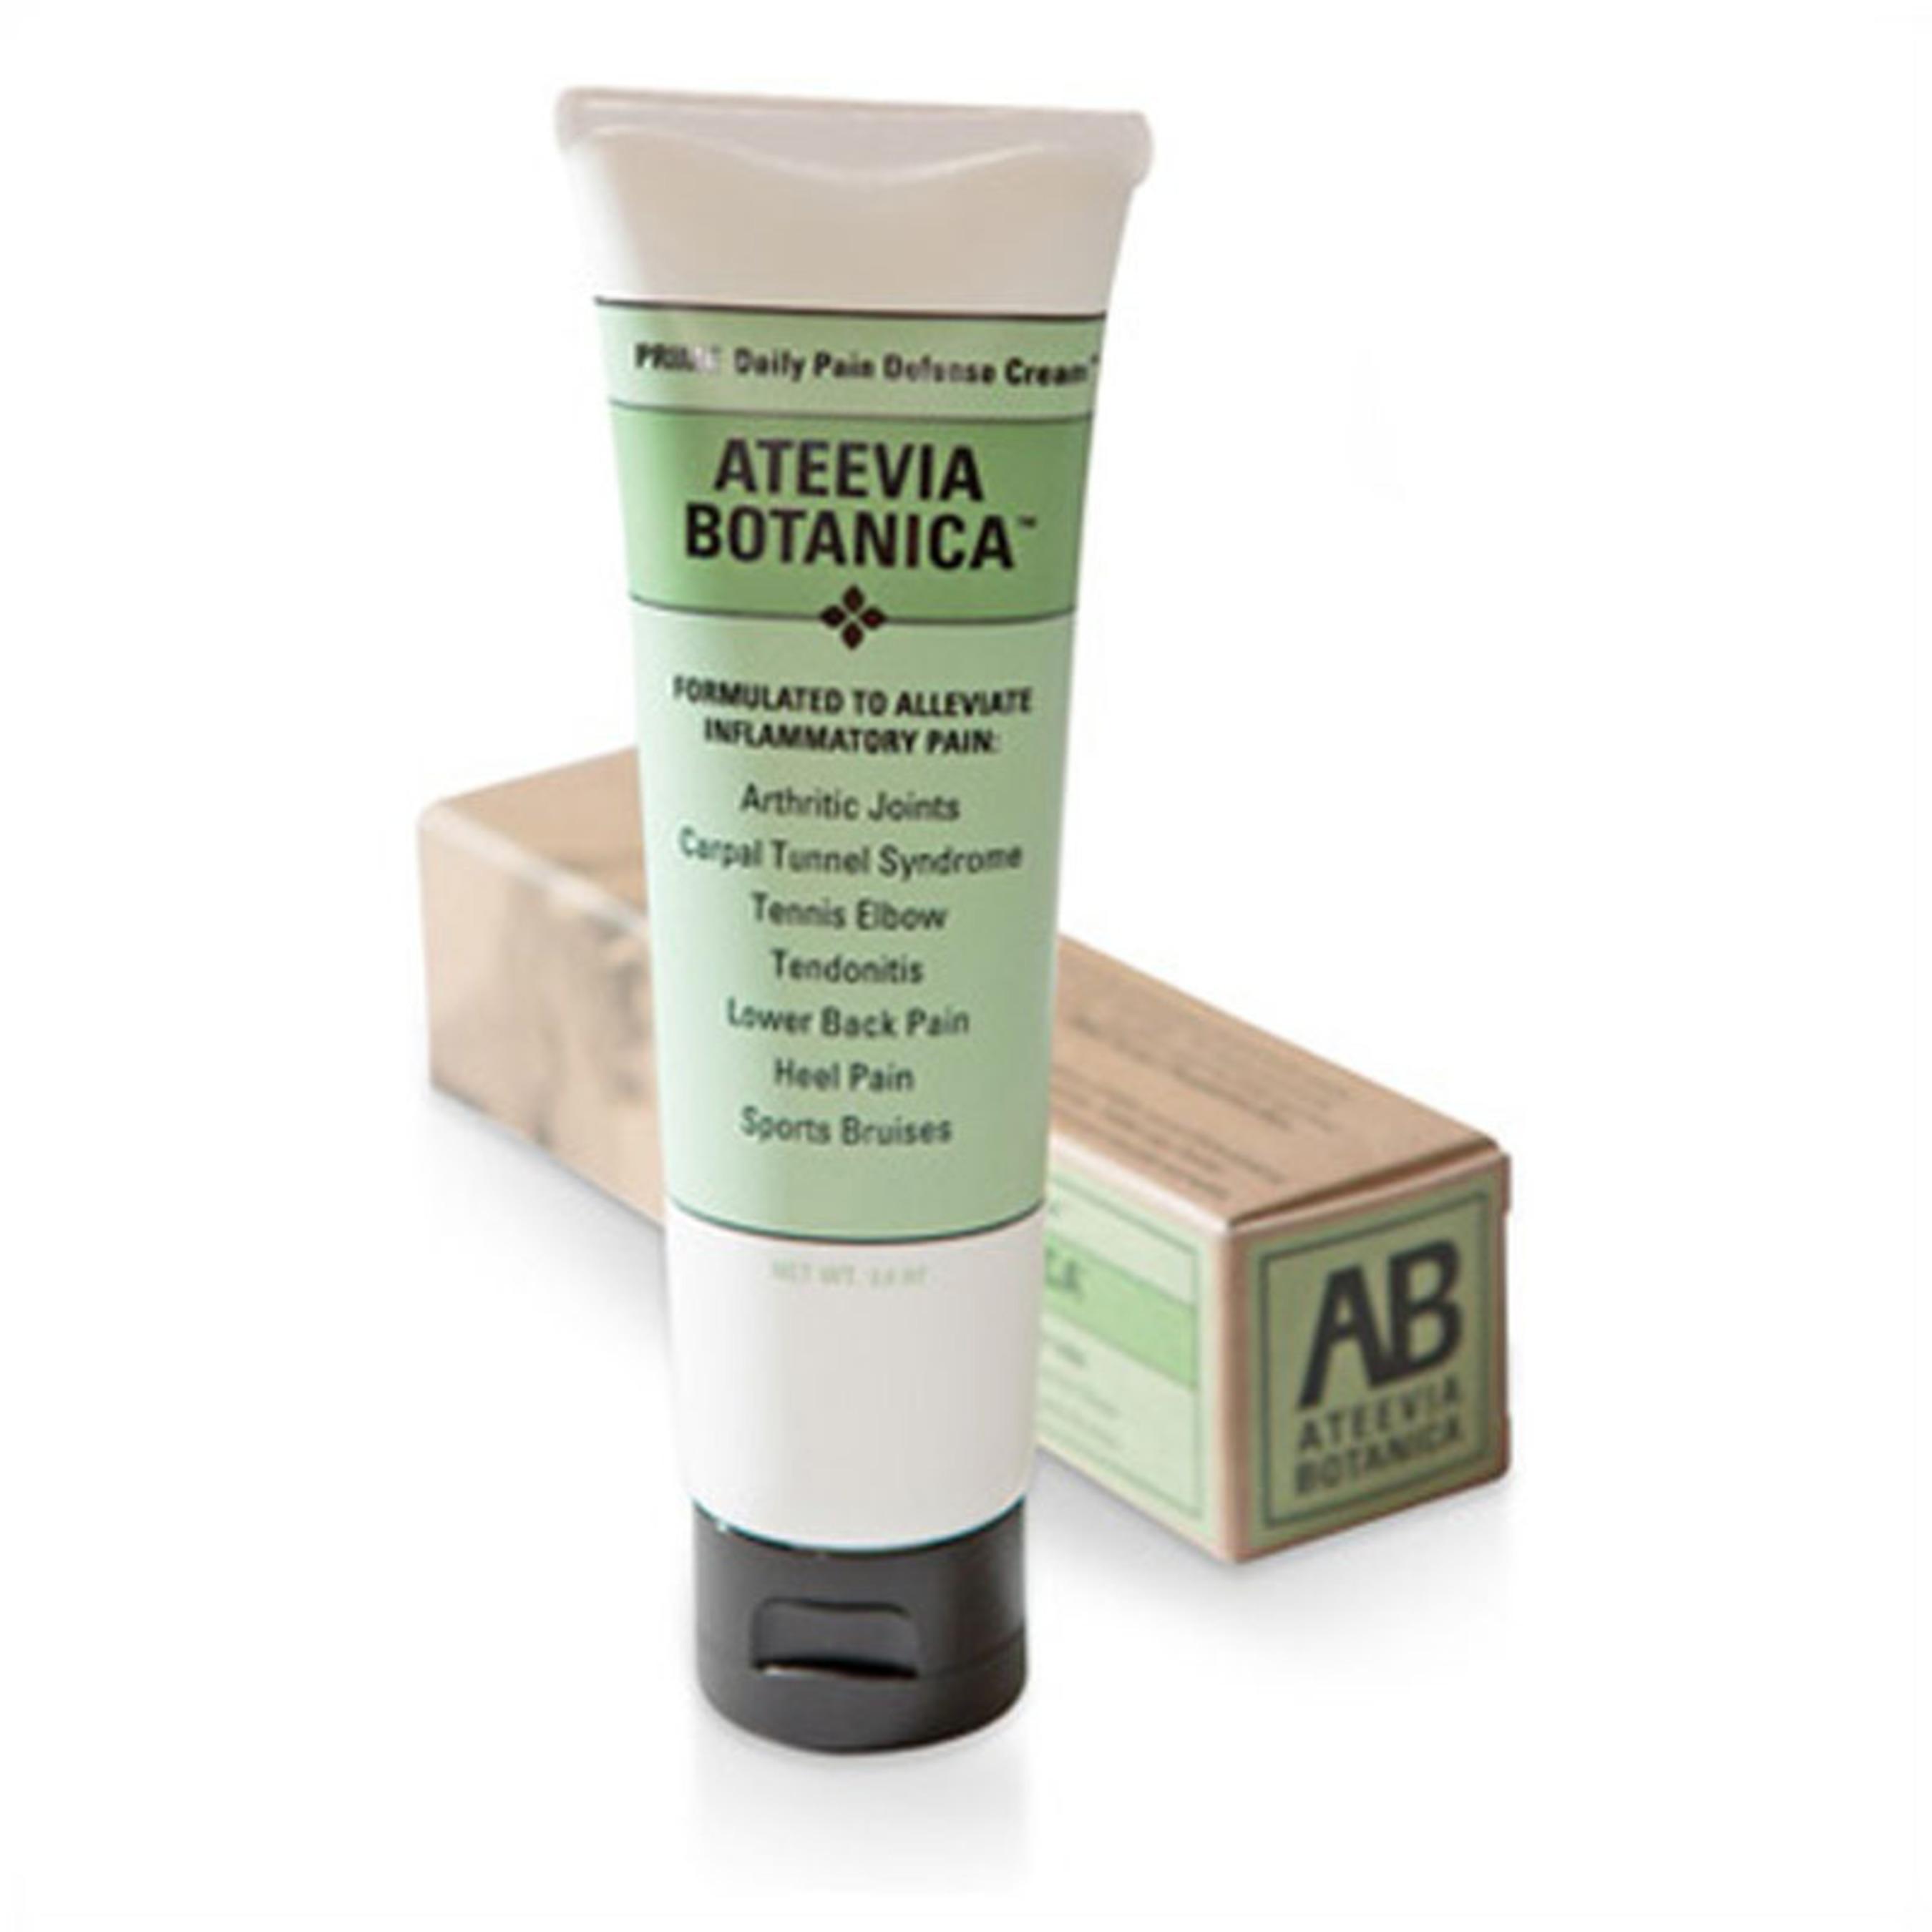 Ateevia Botanica.  (PRNewsFoto/Alquemiste LLC)